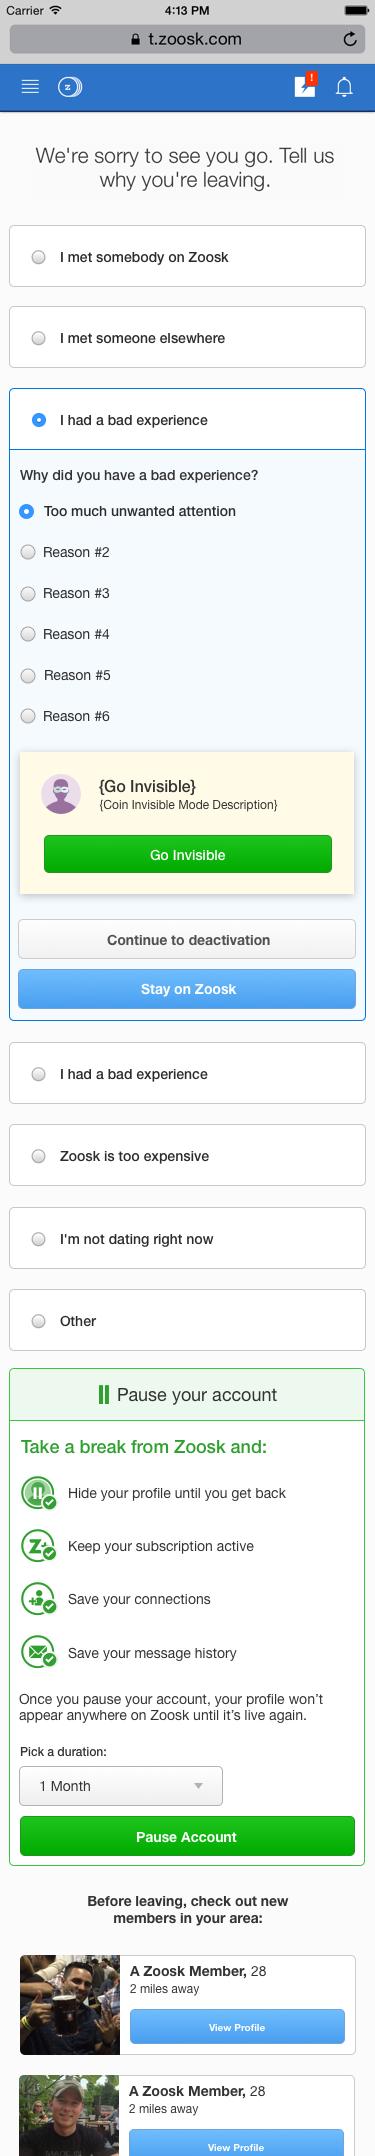 zoosk deactivate profile